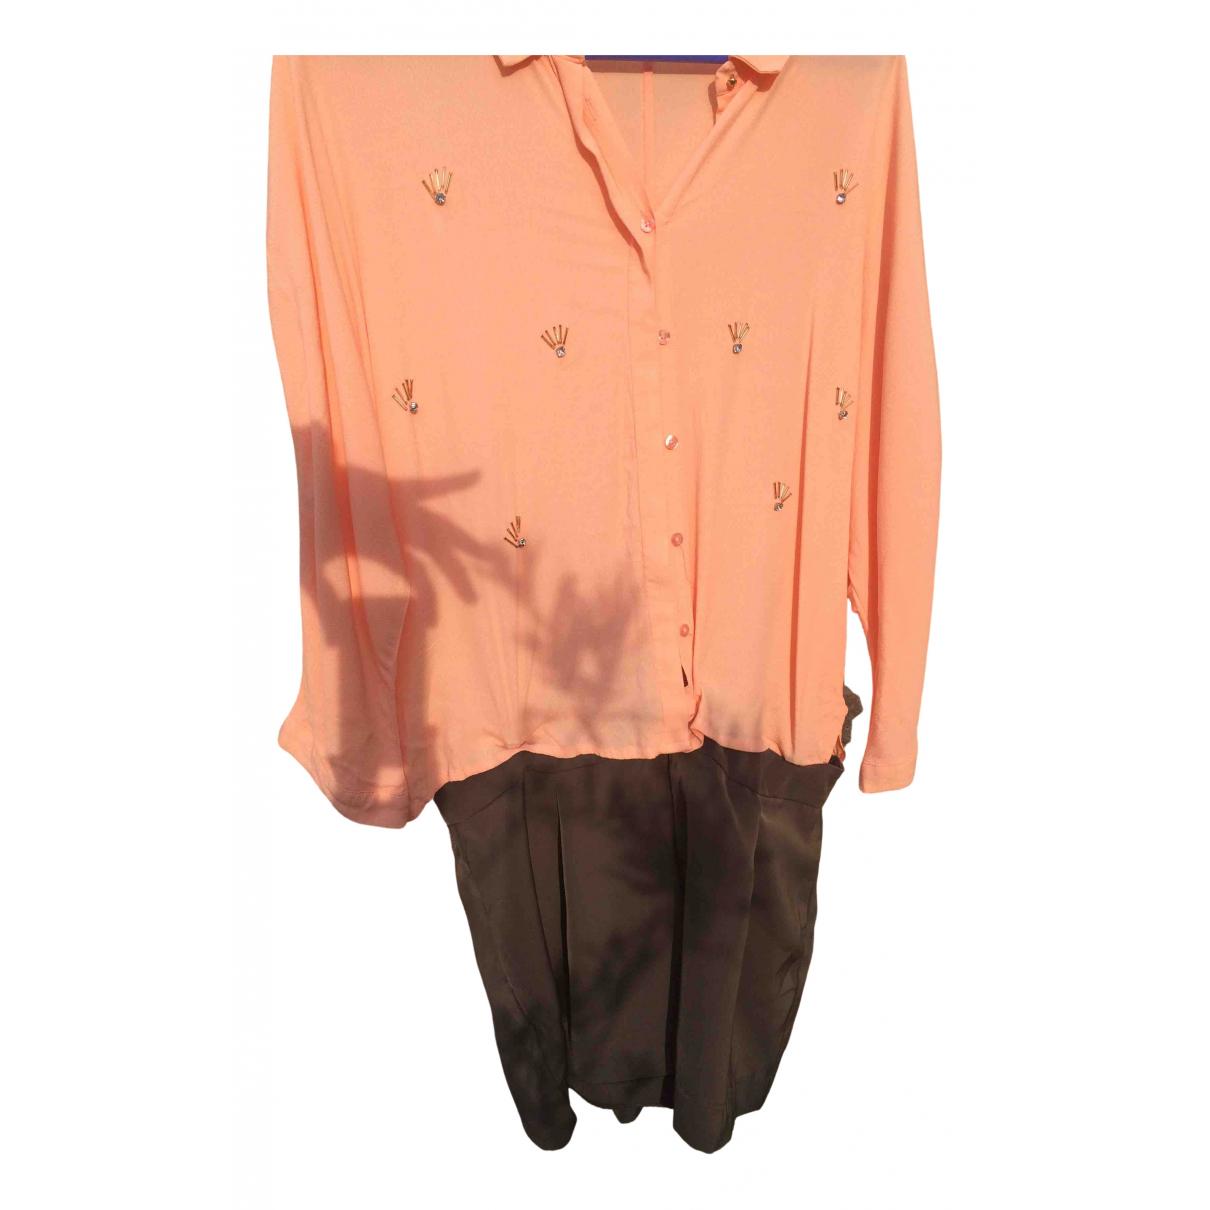 Ikks N Orange jumpsuit for Women One Size FR